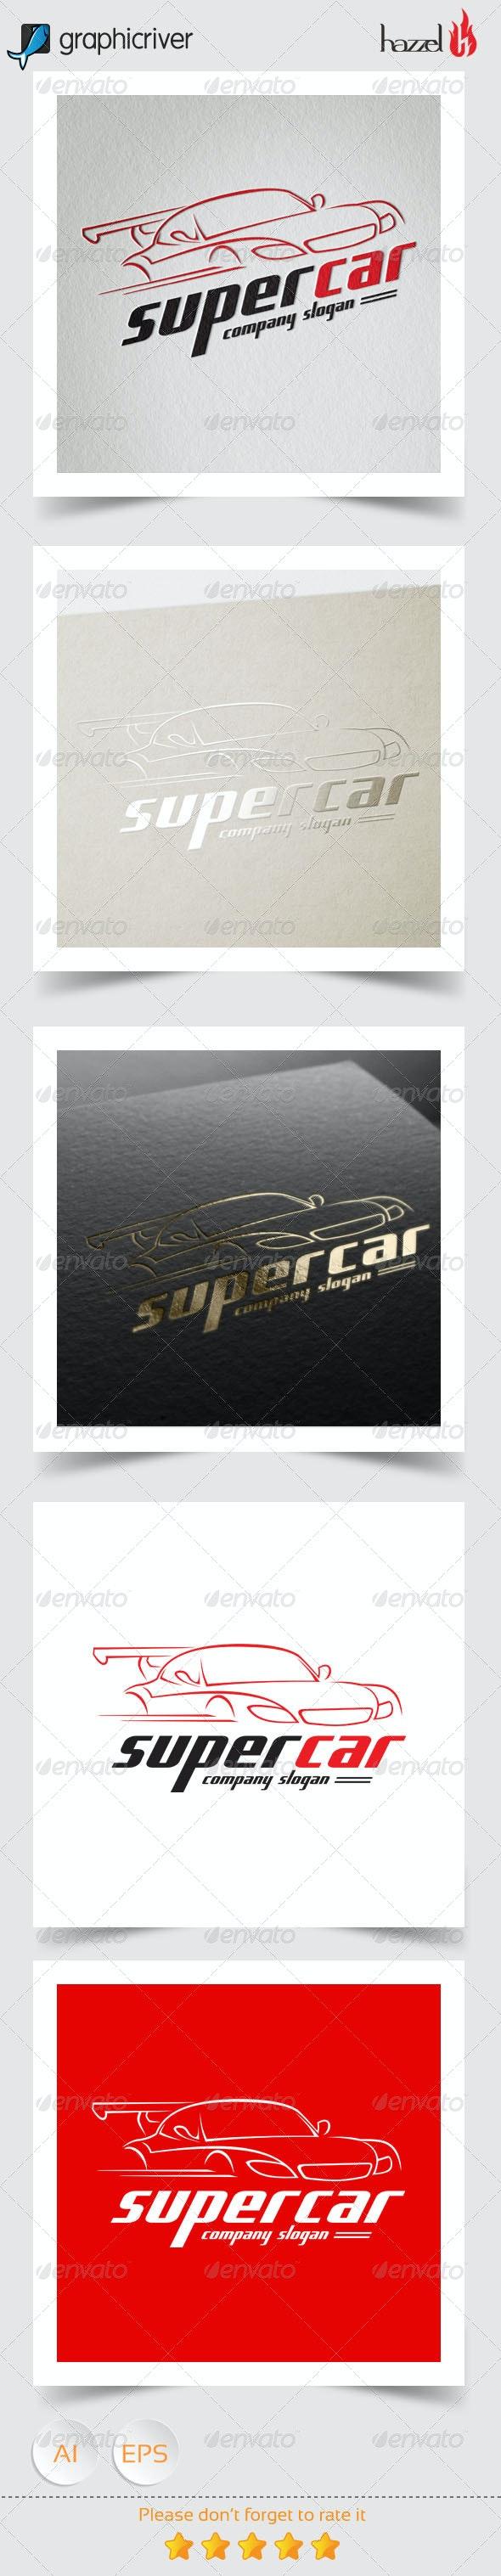 Super Car Logo - Objects Logo Templates